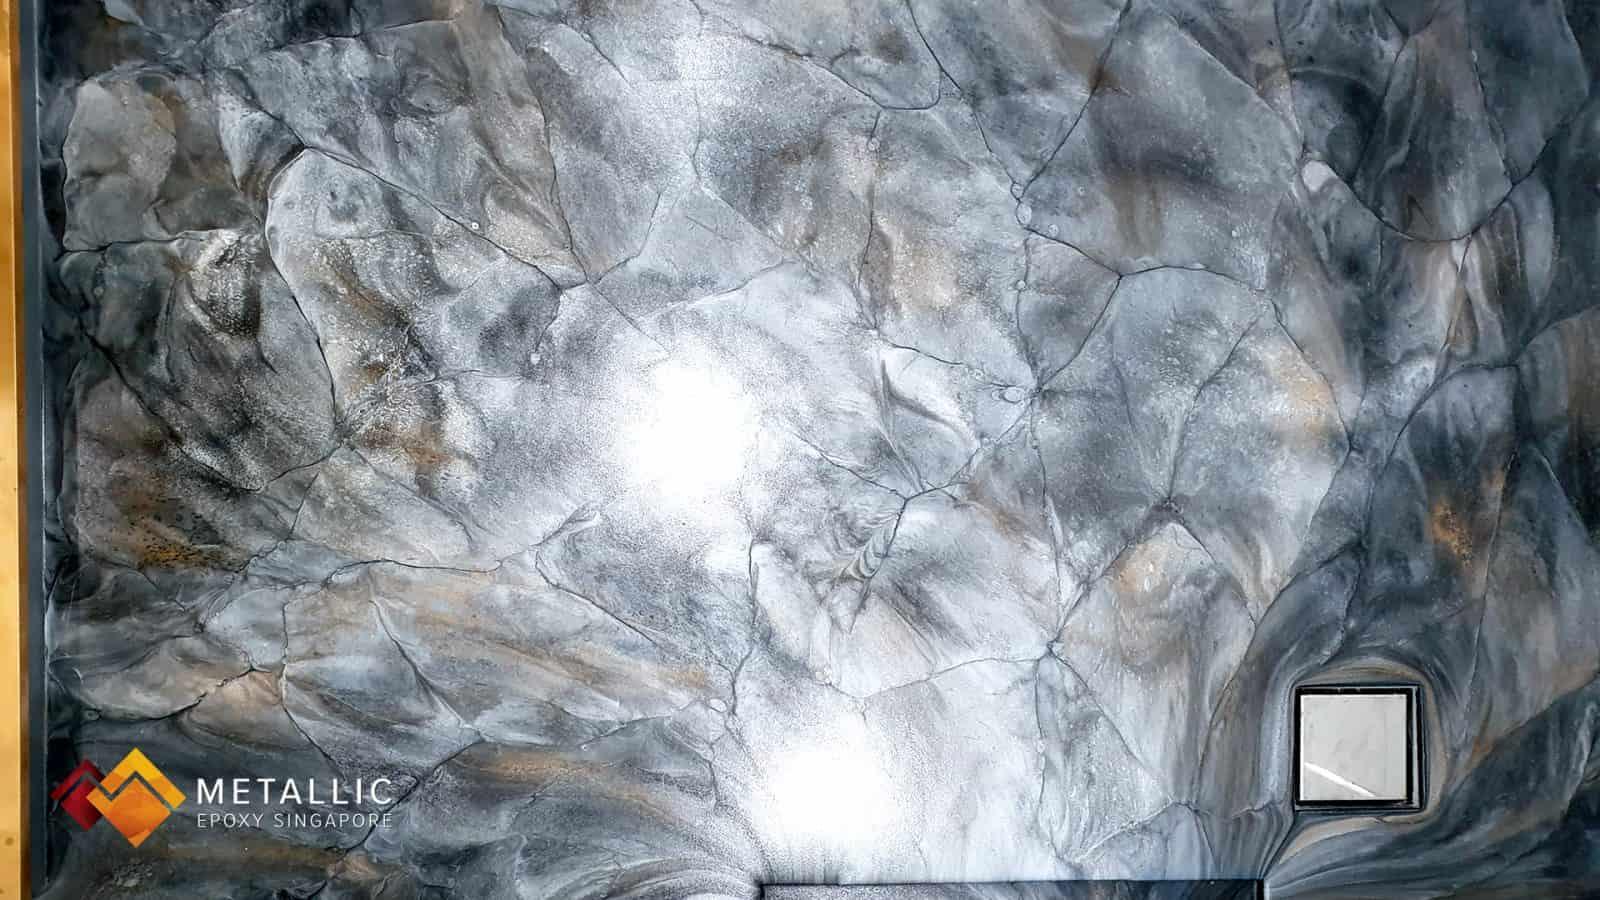 Metallic Stone Bathroom Flooring